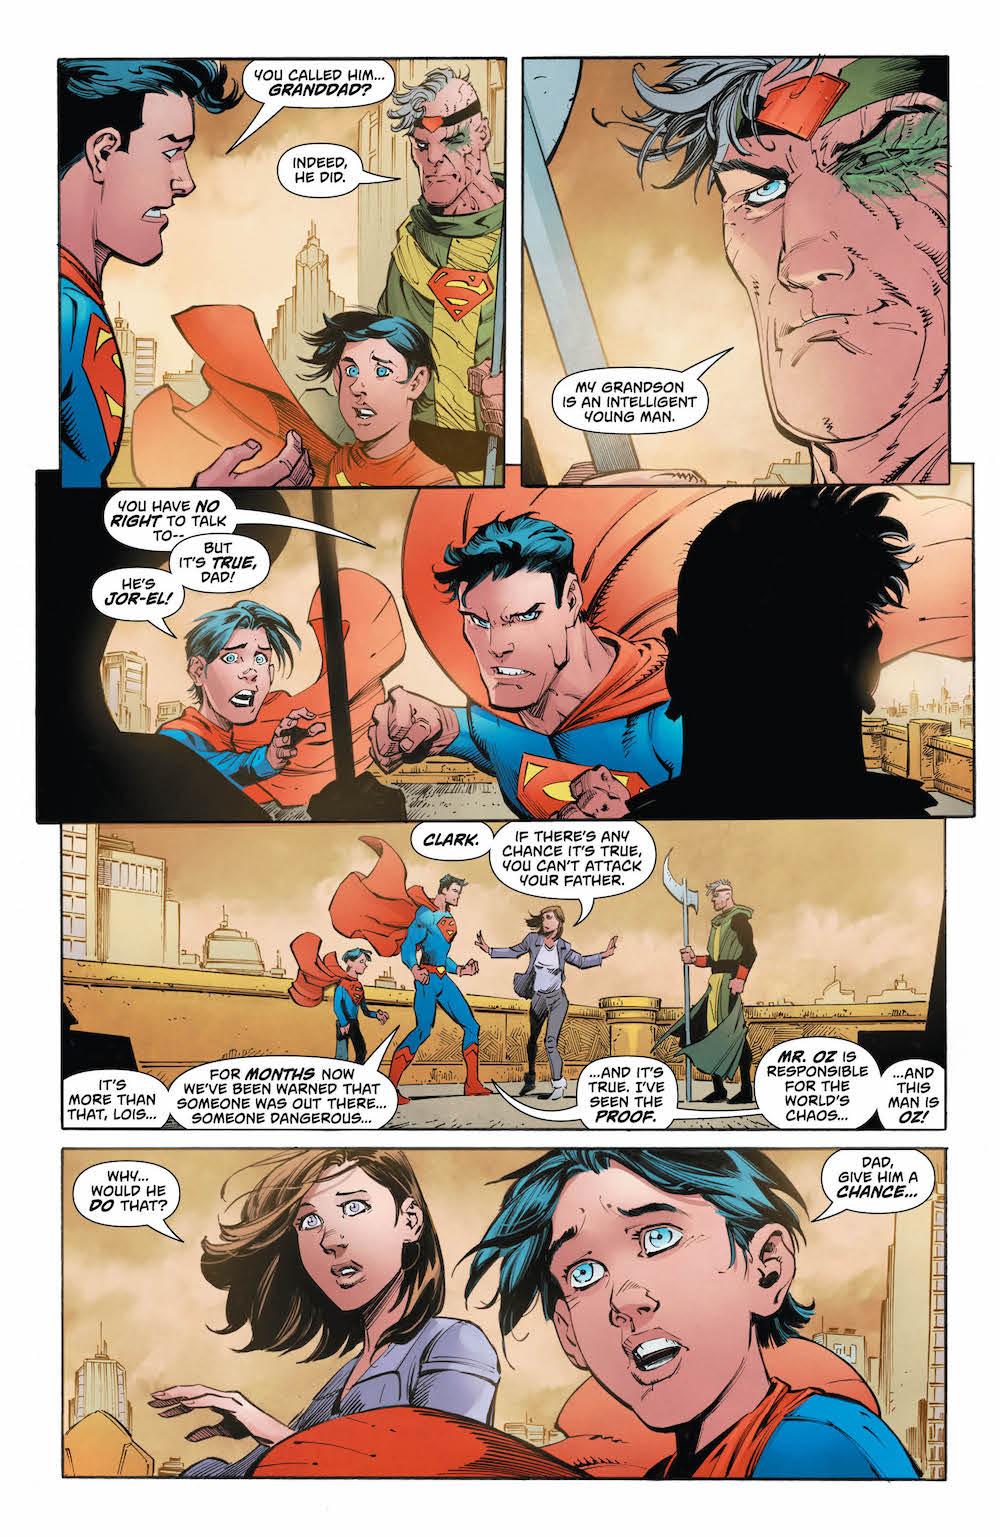 Jon Kent, Lois Lane, Superman, Jor-El, Action Comics 2017